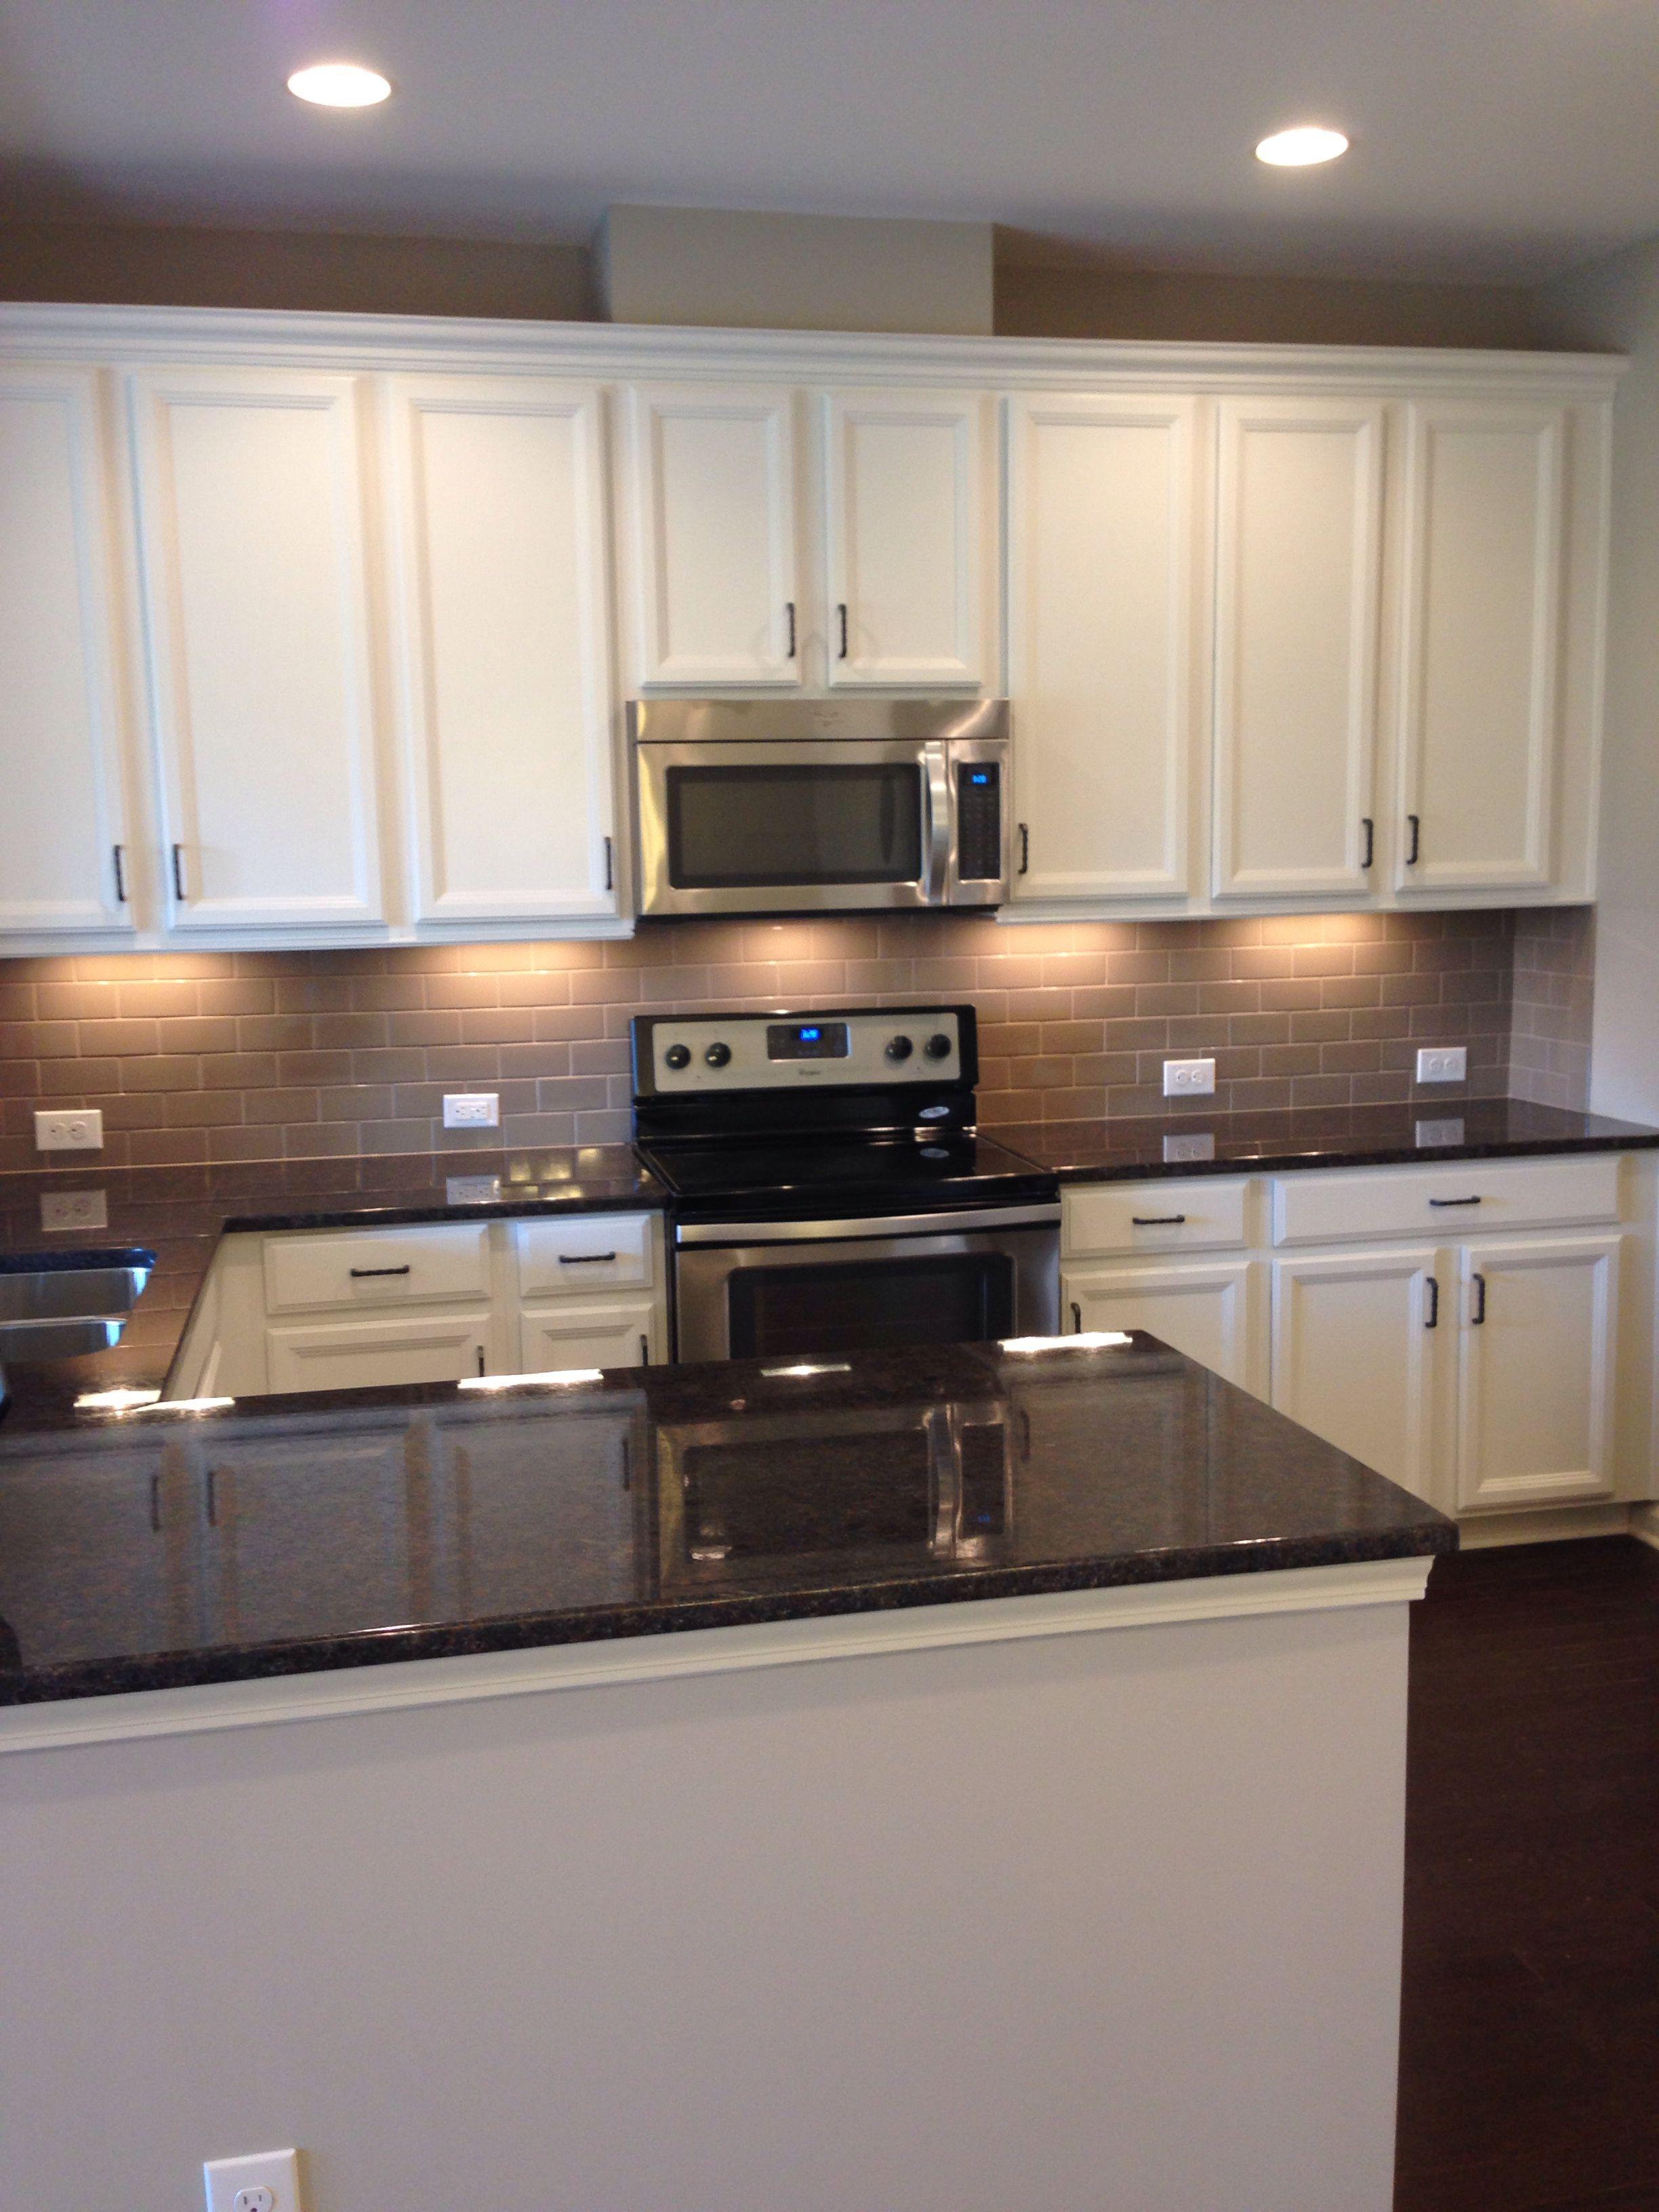 My New Kitchen White Cabinets Tan Subway Tile Backsplash